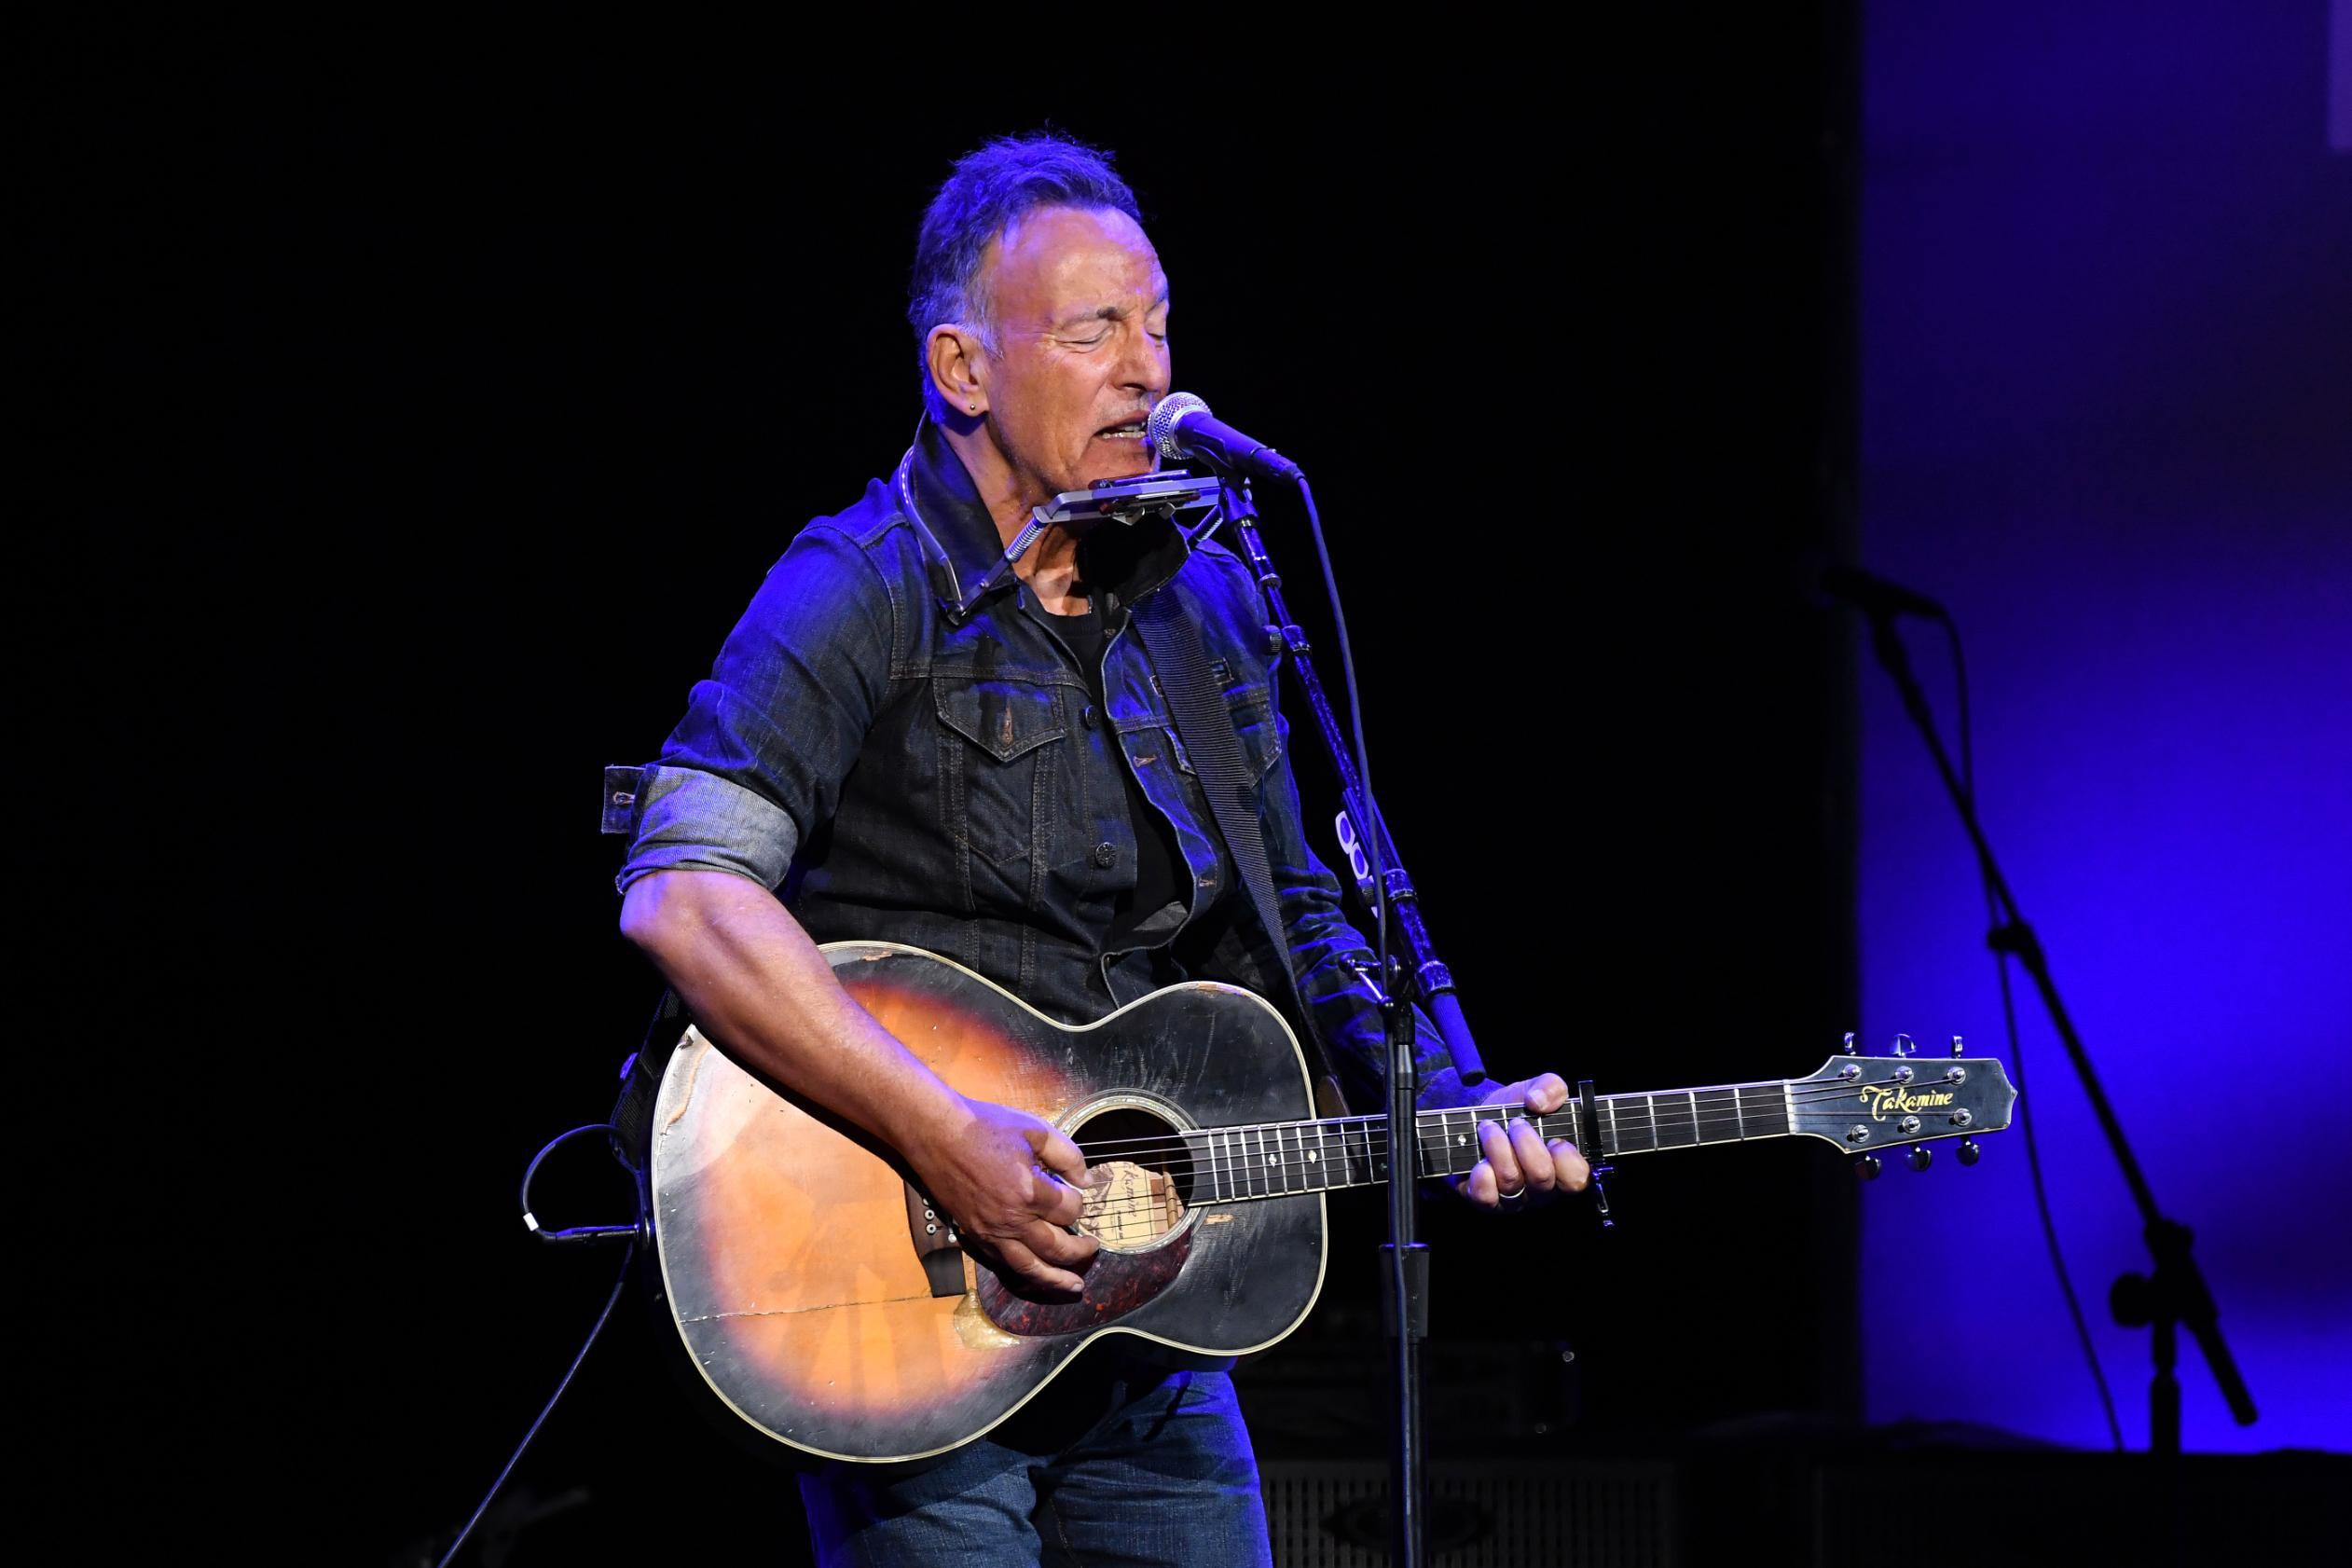 Bruce Springsteen's manager ends 'Thunder Road' lyric debate